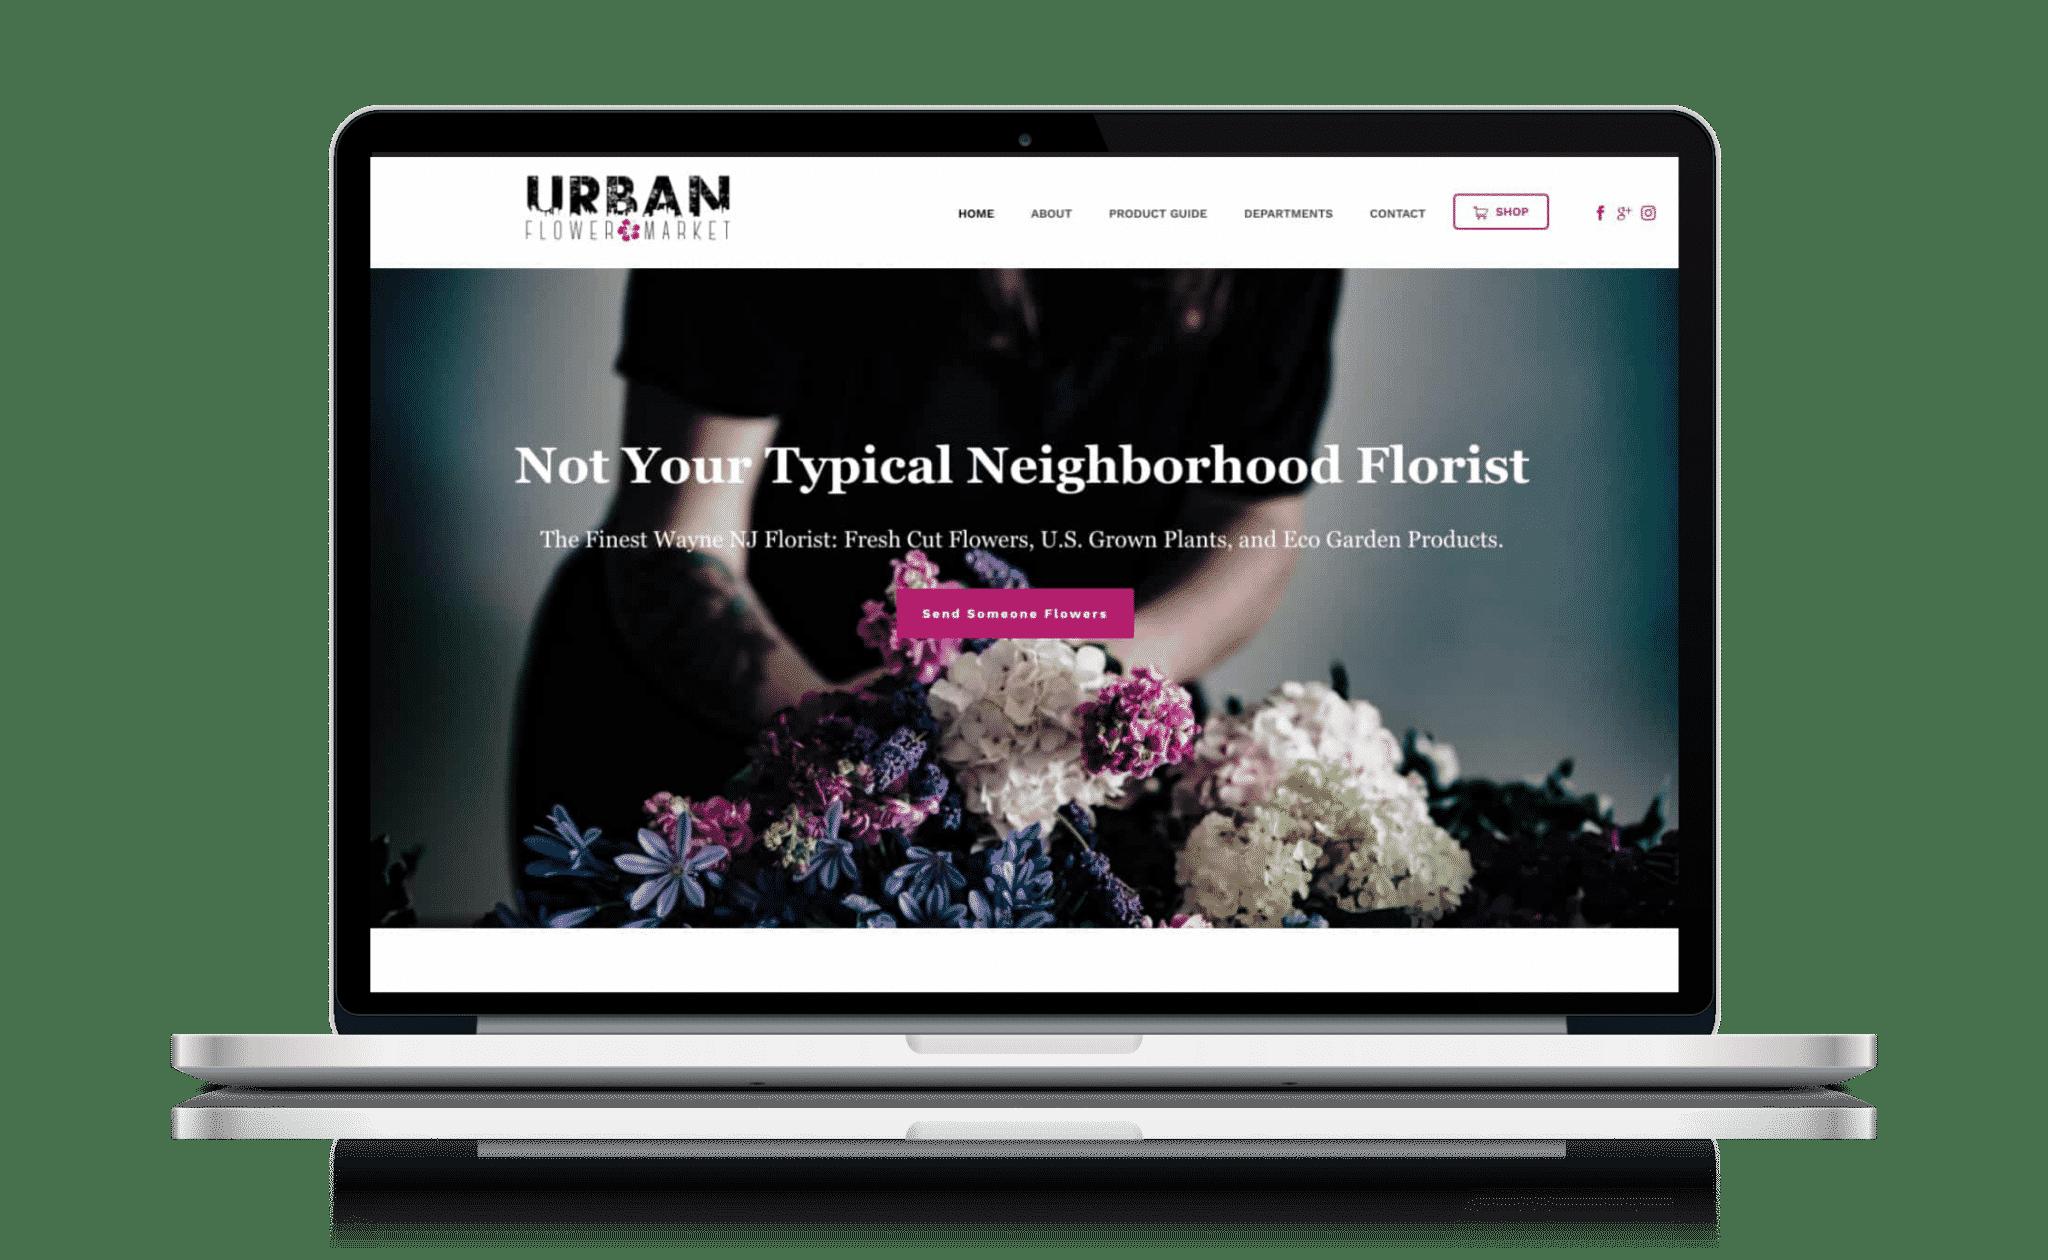 nj-florist-small-business-web-design